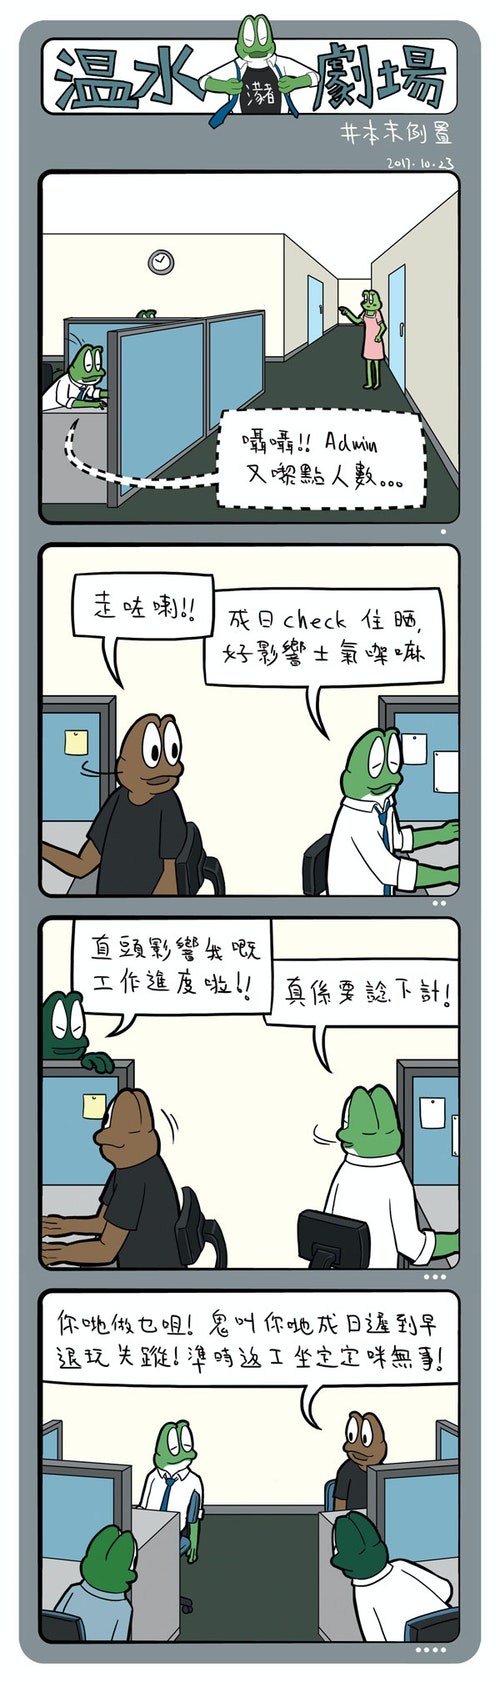 frog_news_lens_123_528